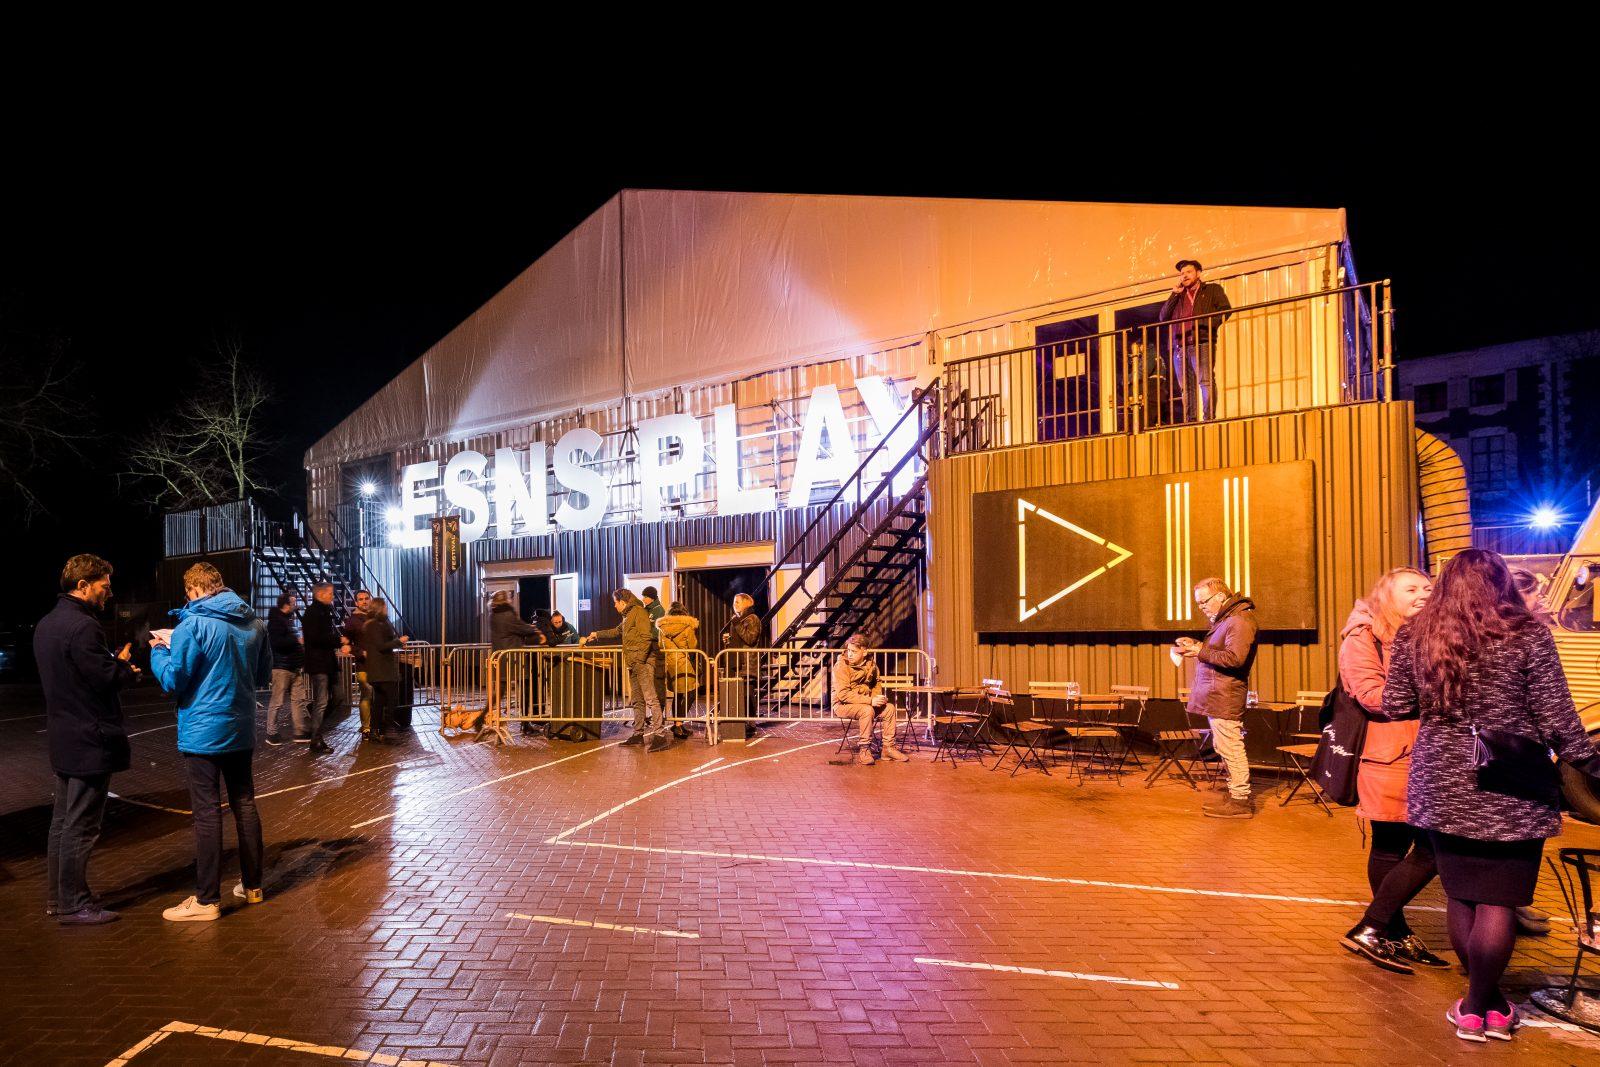 Triomf - Ossenmarkt - ESNS PLAY Venue